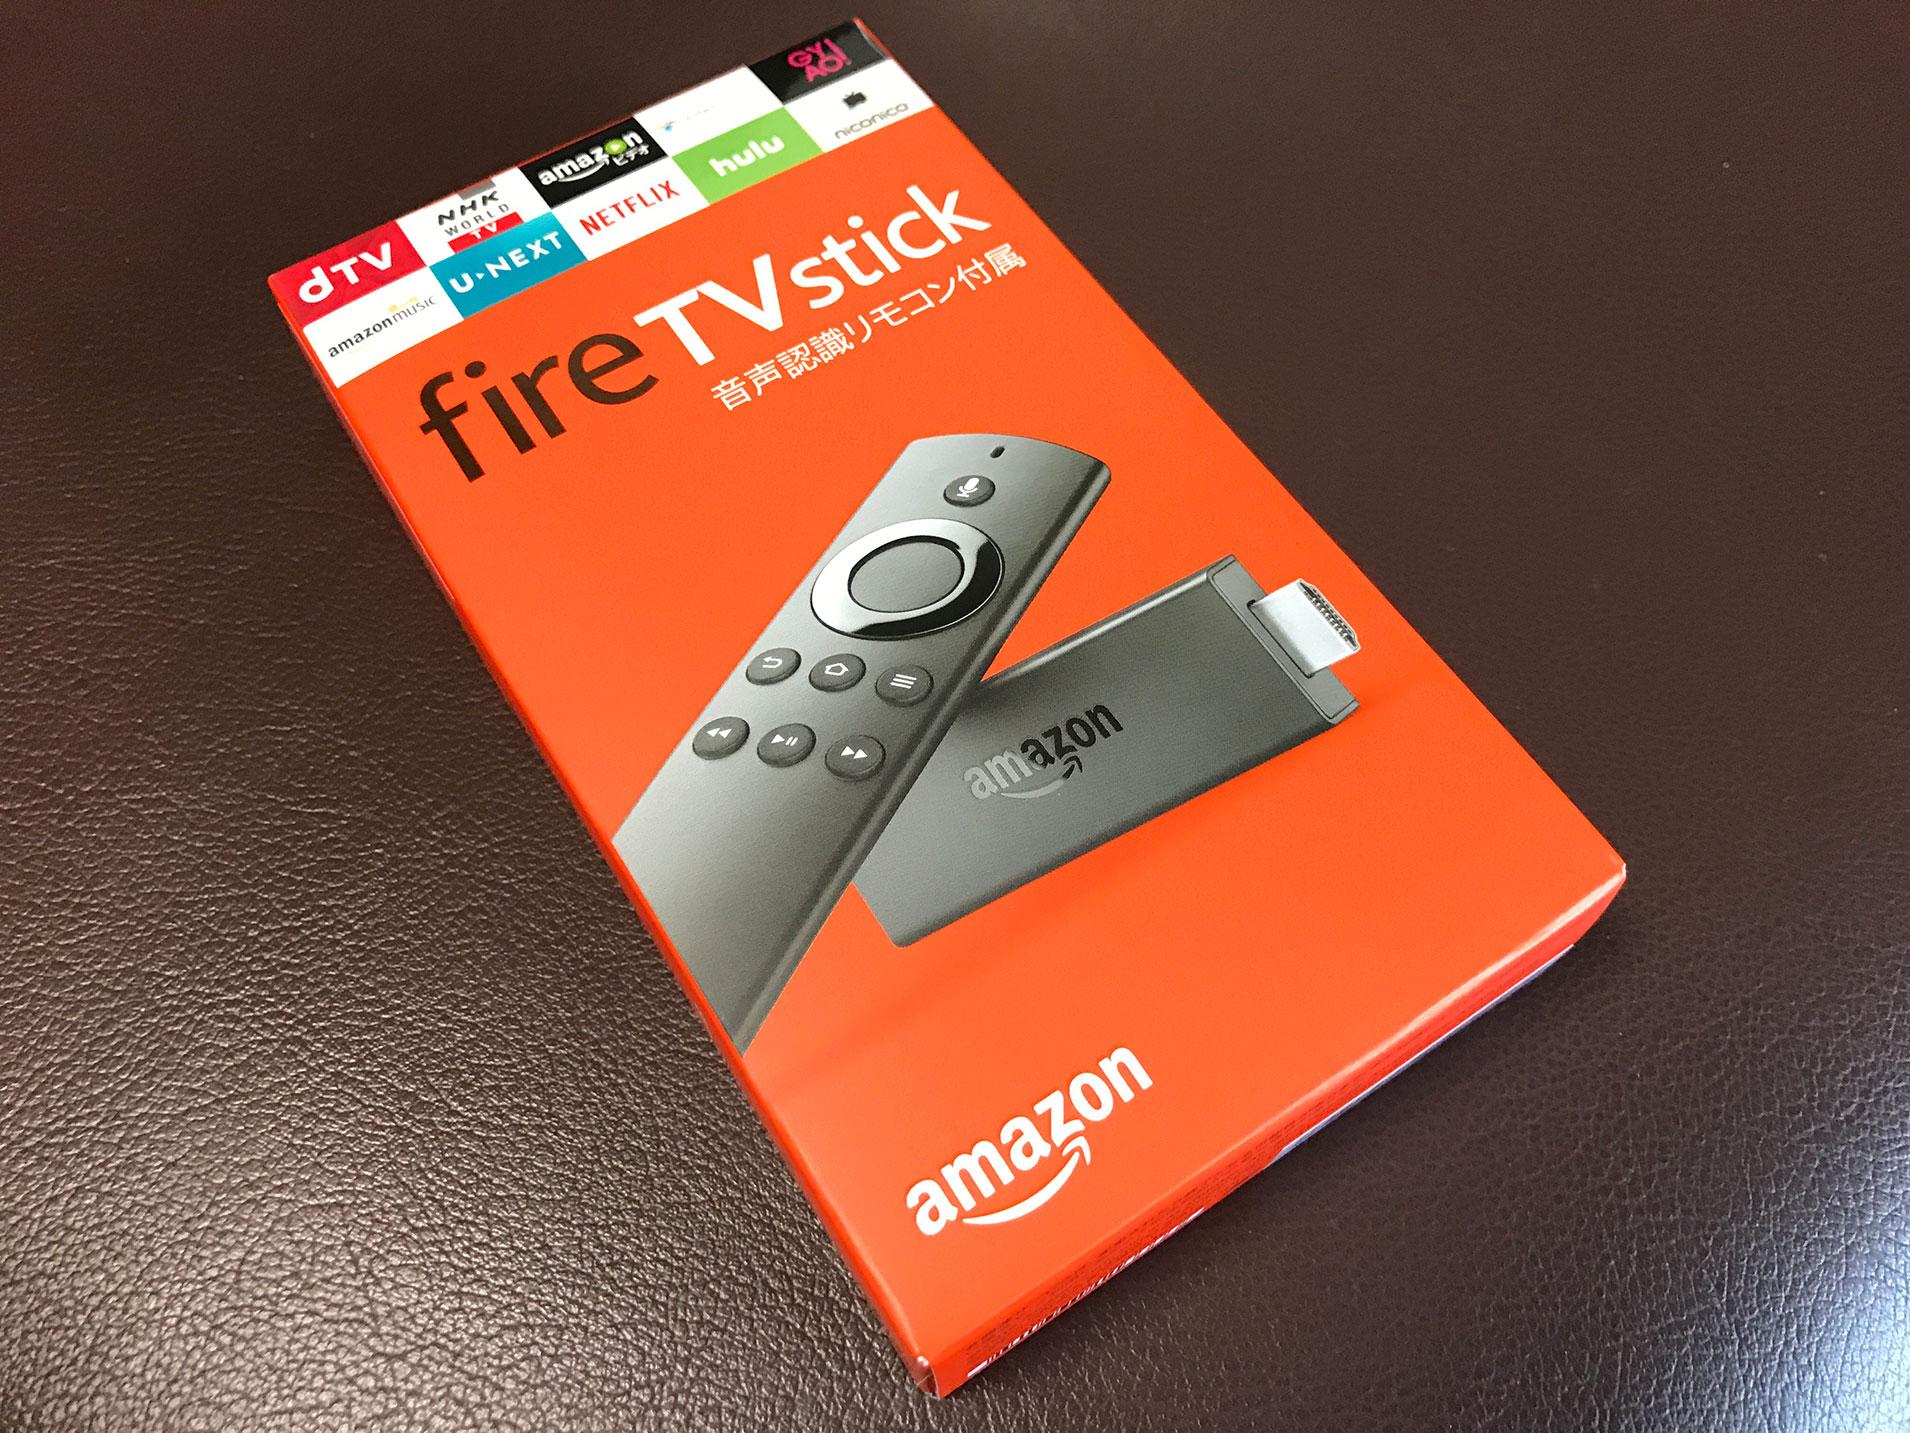 fireTVstick 箱